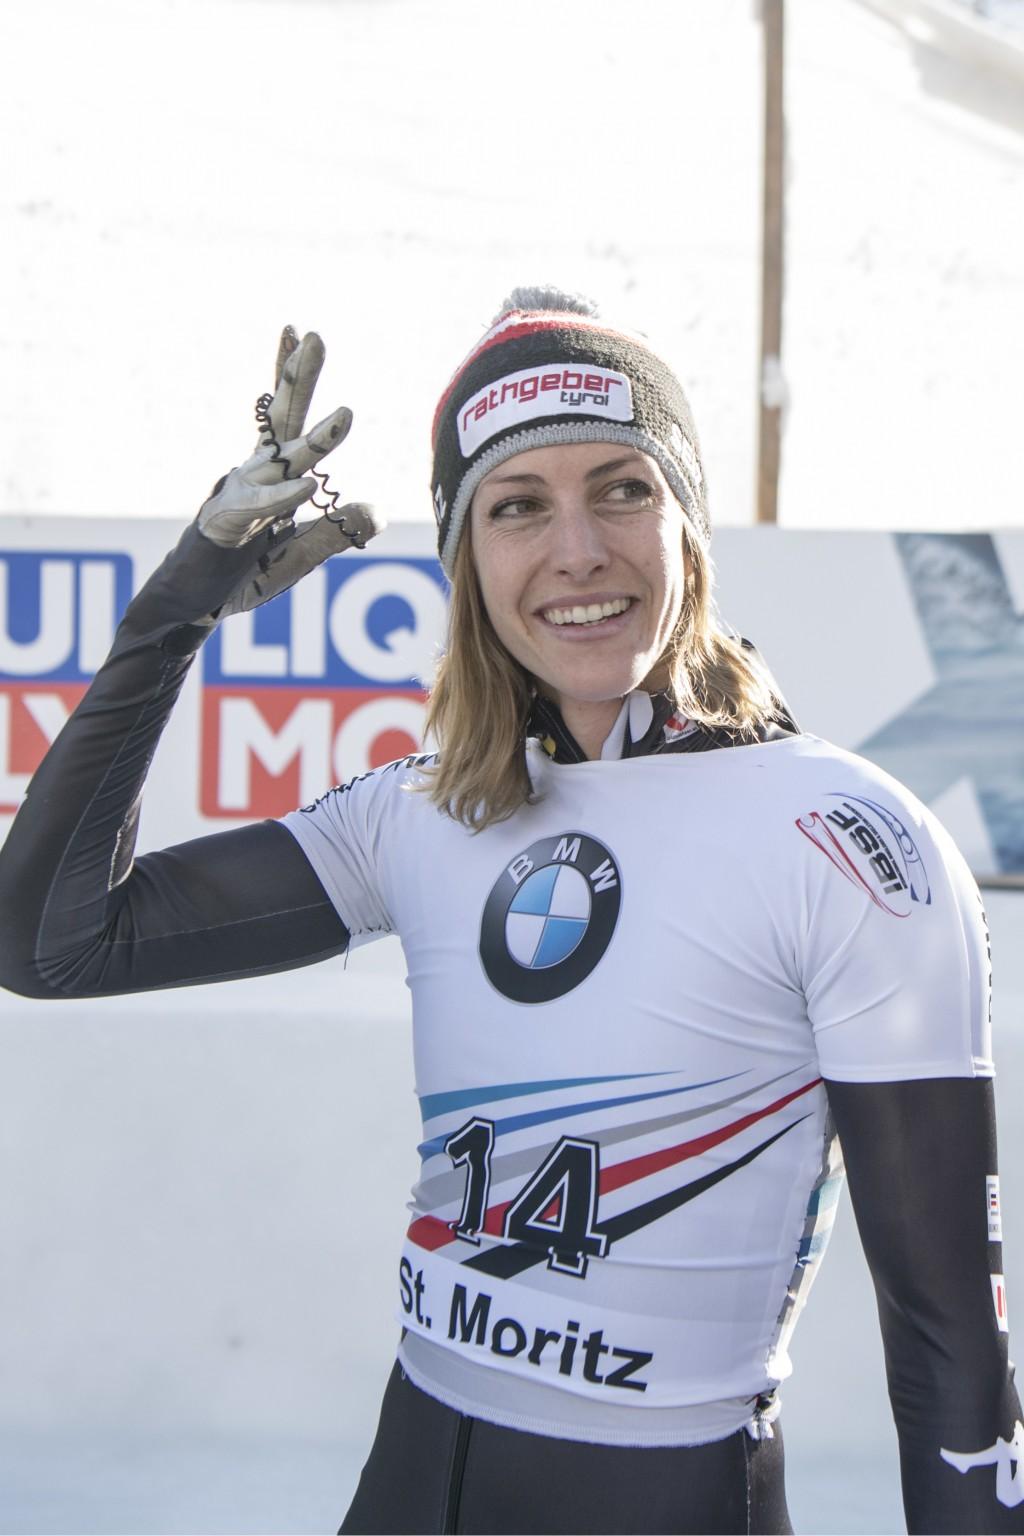 Janine Flock of Austria celebrates after winning the women's skeleton World Cup in St. Moritz, Switzerland, Friday, Jan. 12, 2018. (Urs Flueeler/Keyst